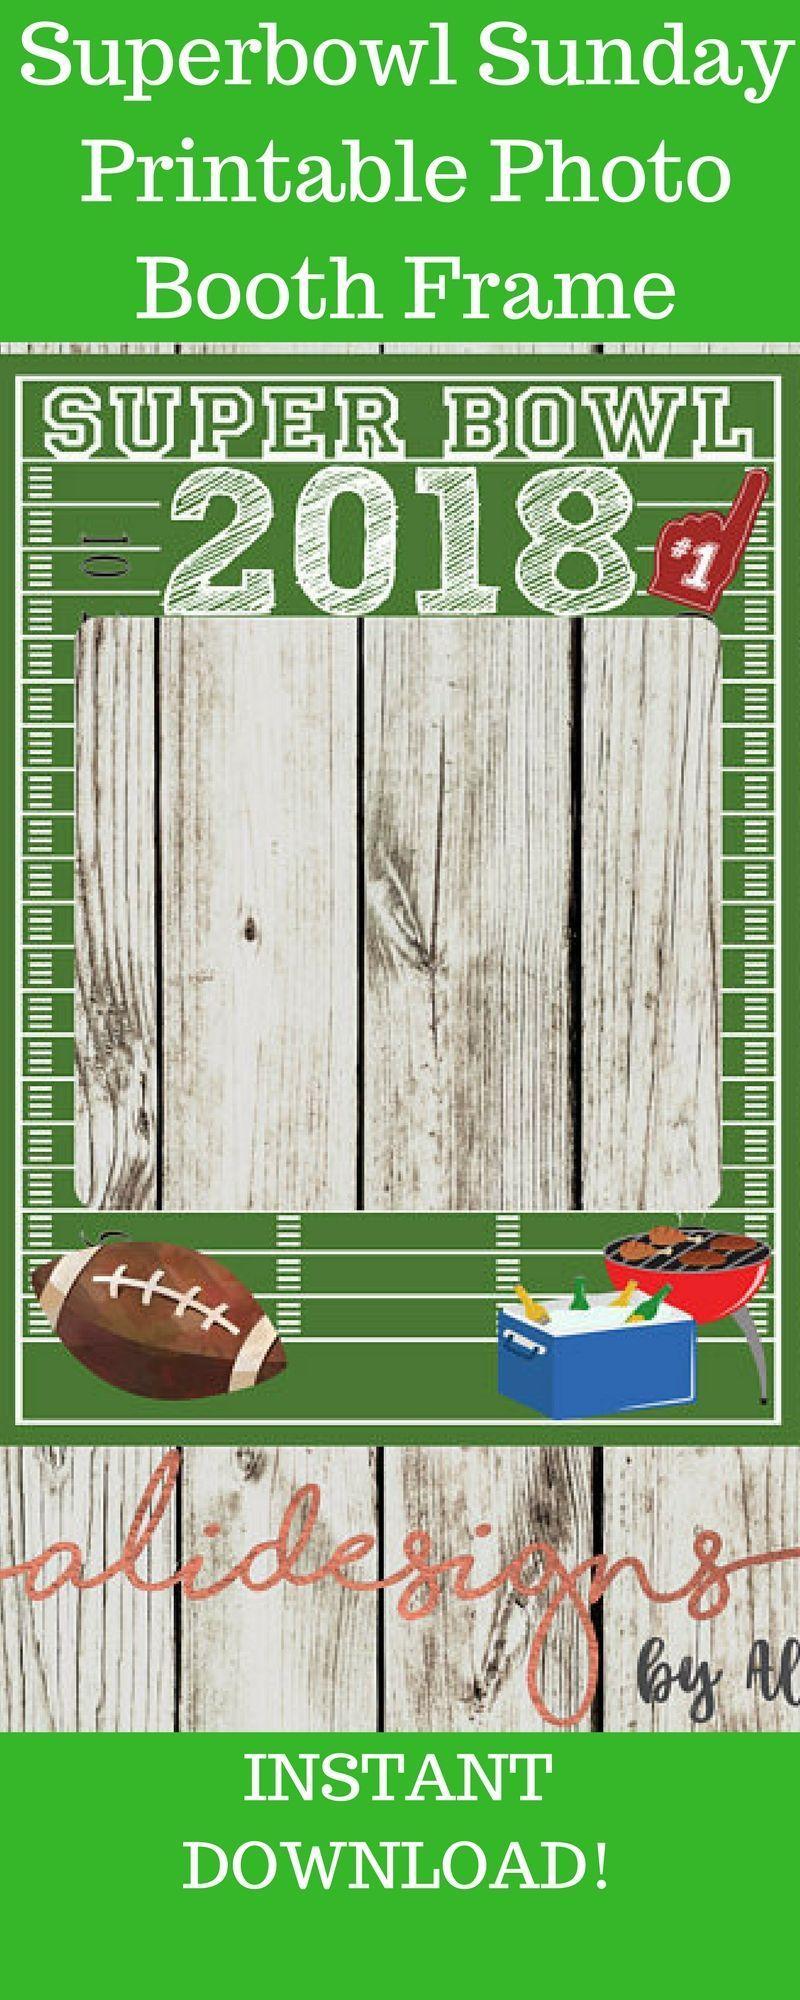 Printable, photo booth frame, super bowl, super bowl party, sports party, footba... -  Printable, photo booth frame, super bowl, super bowl party, sports party, footba… –  Printable, - #booth #Bowl #footba #frame #party #photo #printable #sports #super #superbowlfoodideas #superbowlfoods #superbowlpartydecorations #superbowlpartyfood #superbowlpartyfoodappetizers #superbowlpartygames #superbowlpartyideasdecorations #superbowlrings